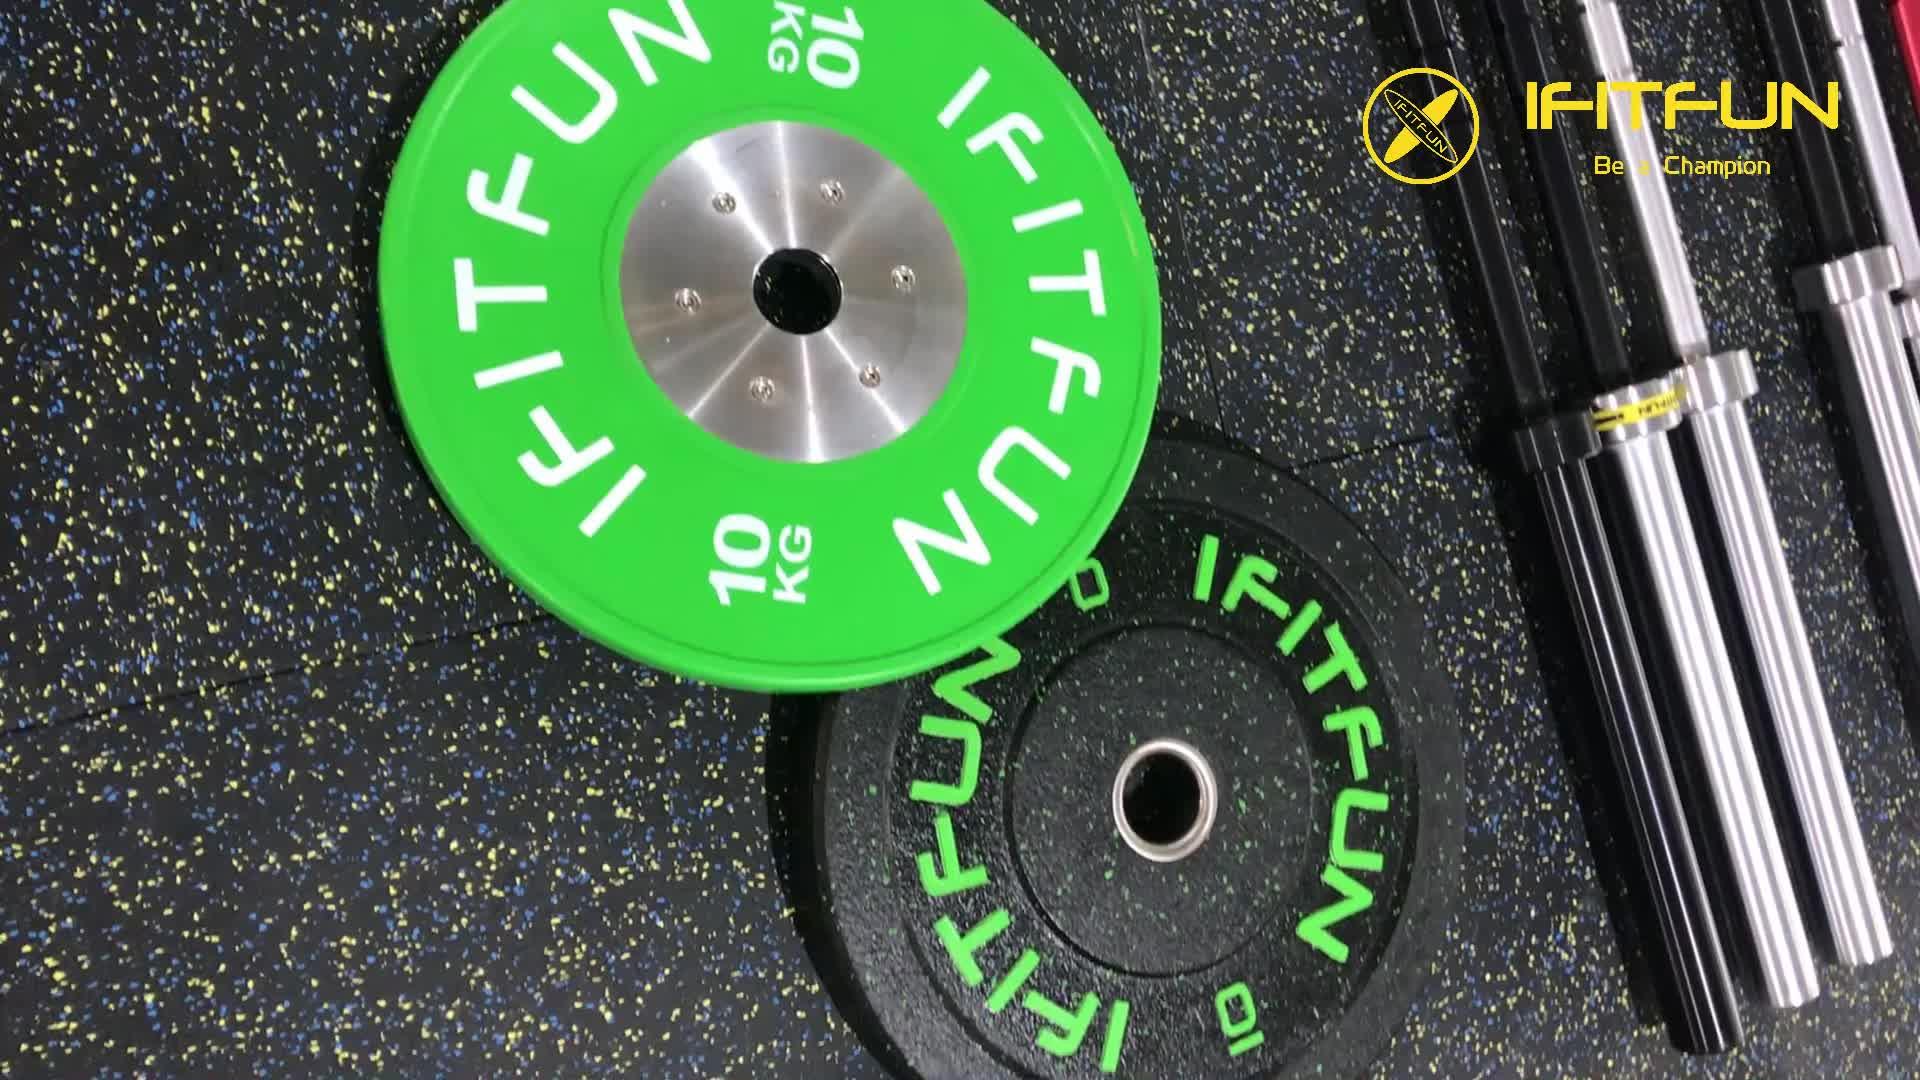 Premium virgin rubber coated concurrentie gewicht bumper platen